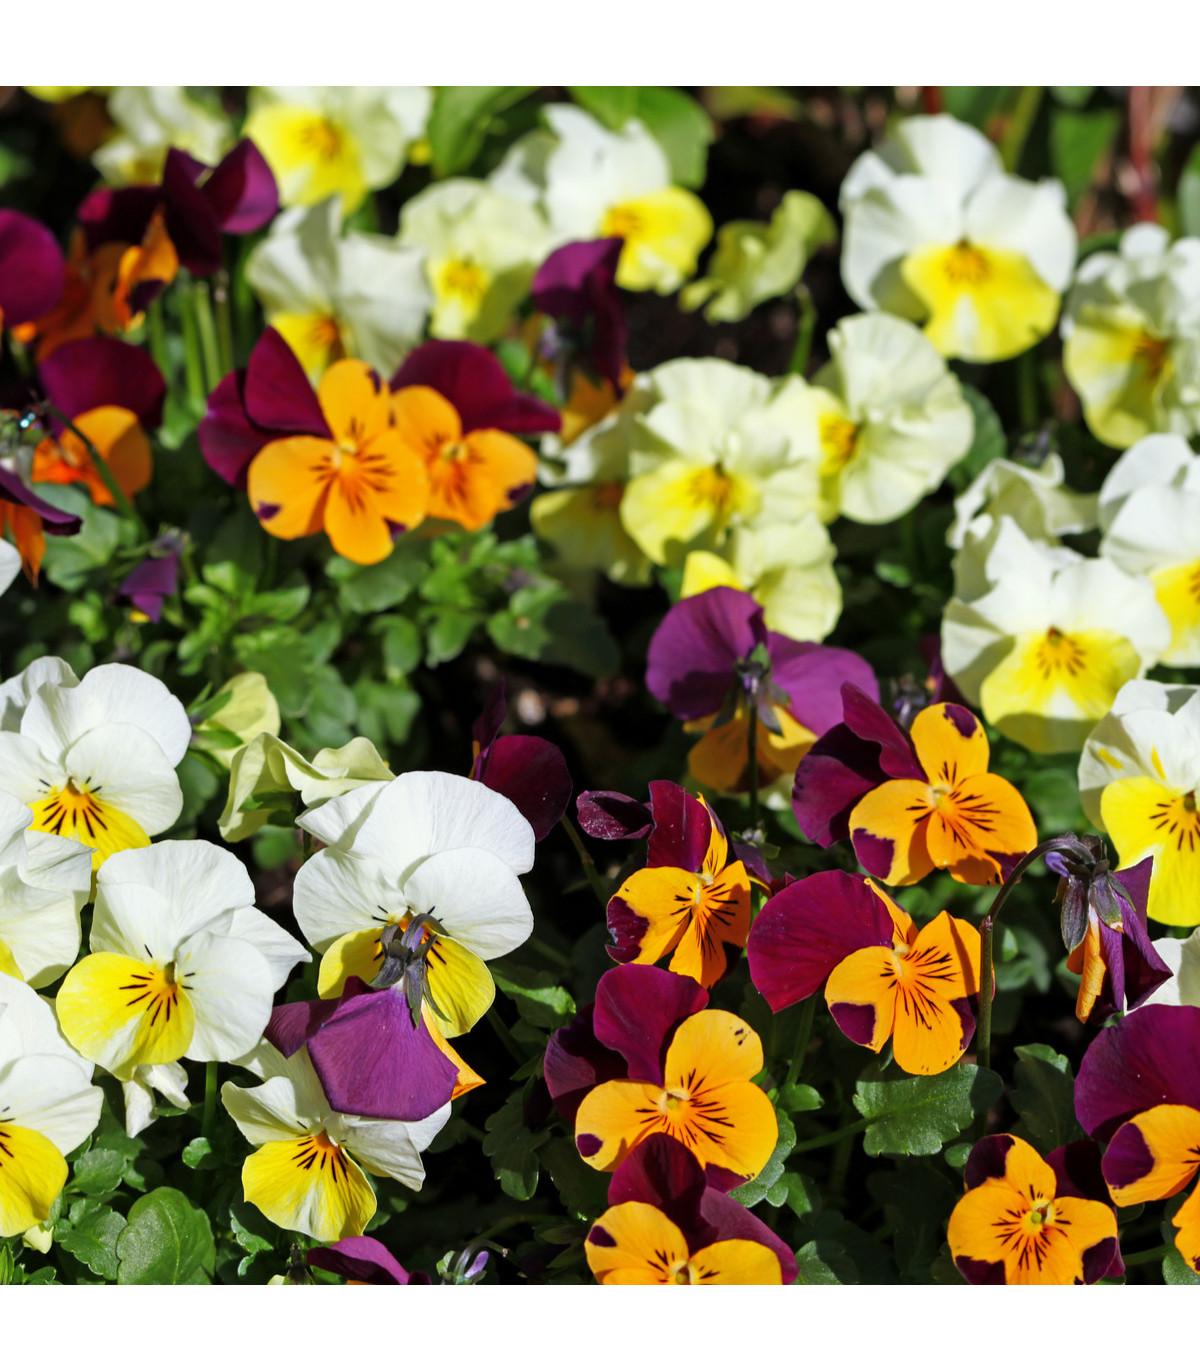 Violka rohatá - semena Violky - Viola cornuta - 70 ks